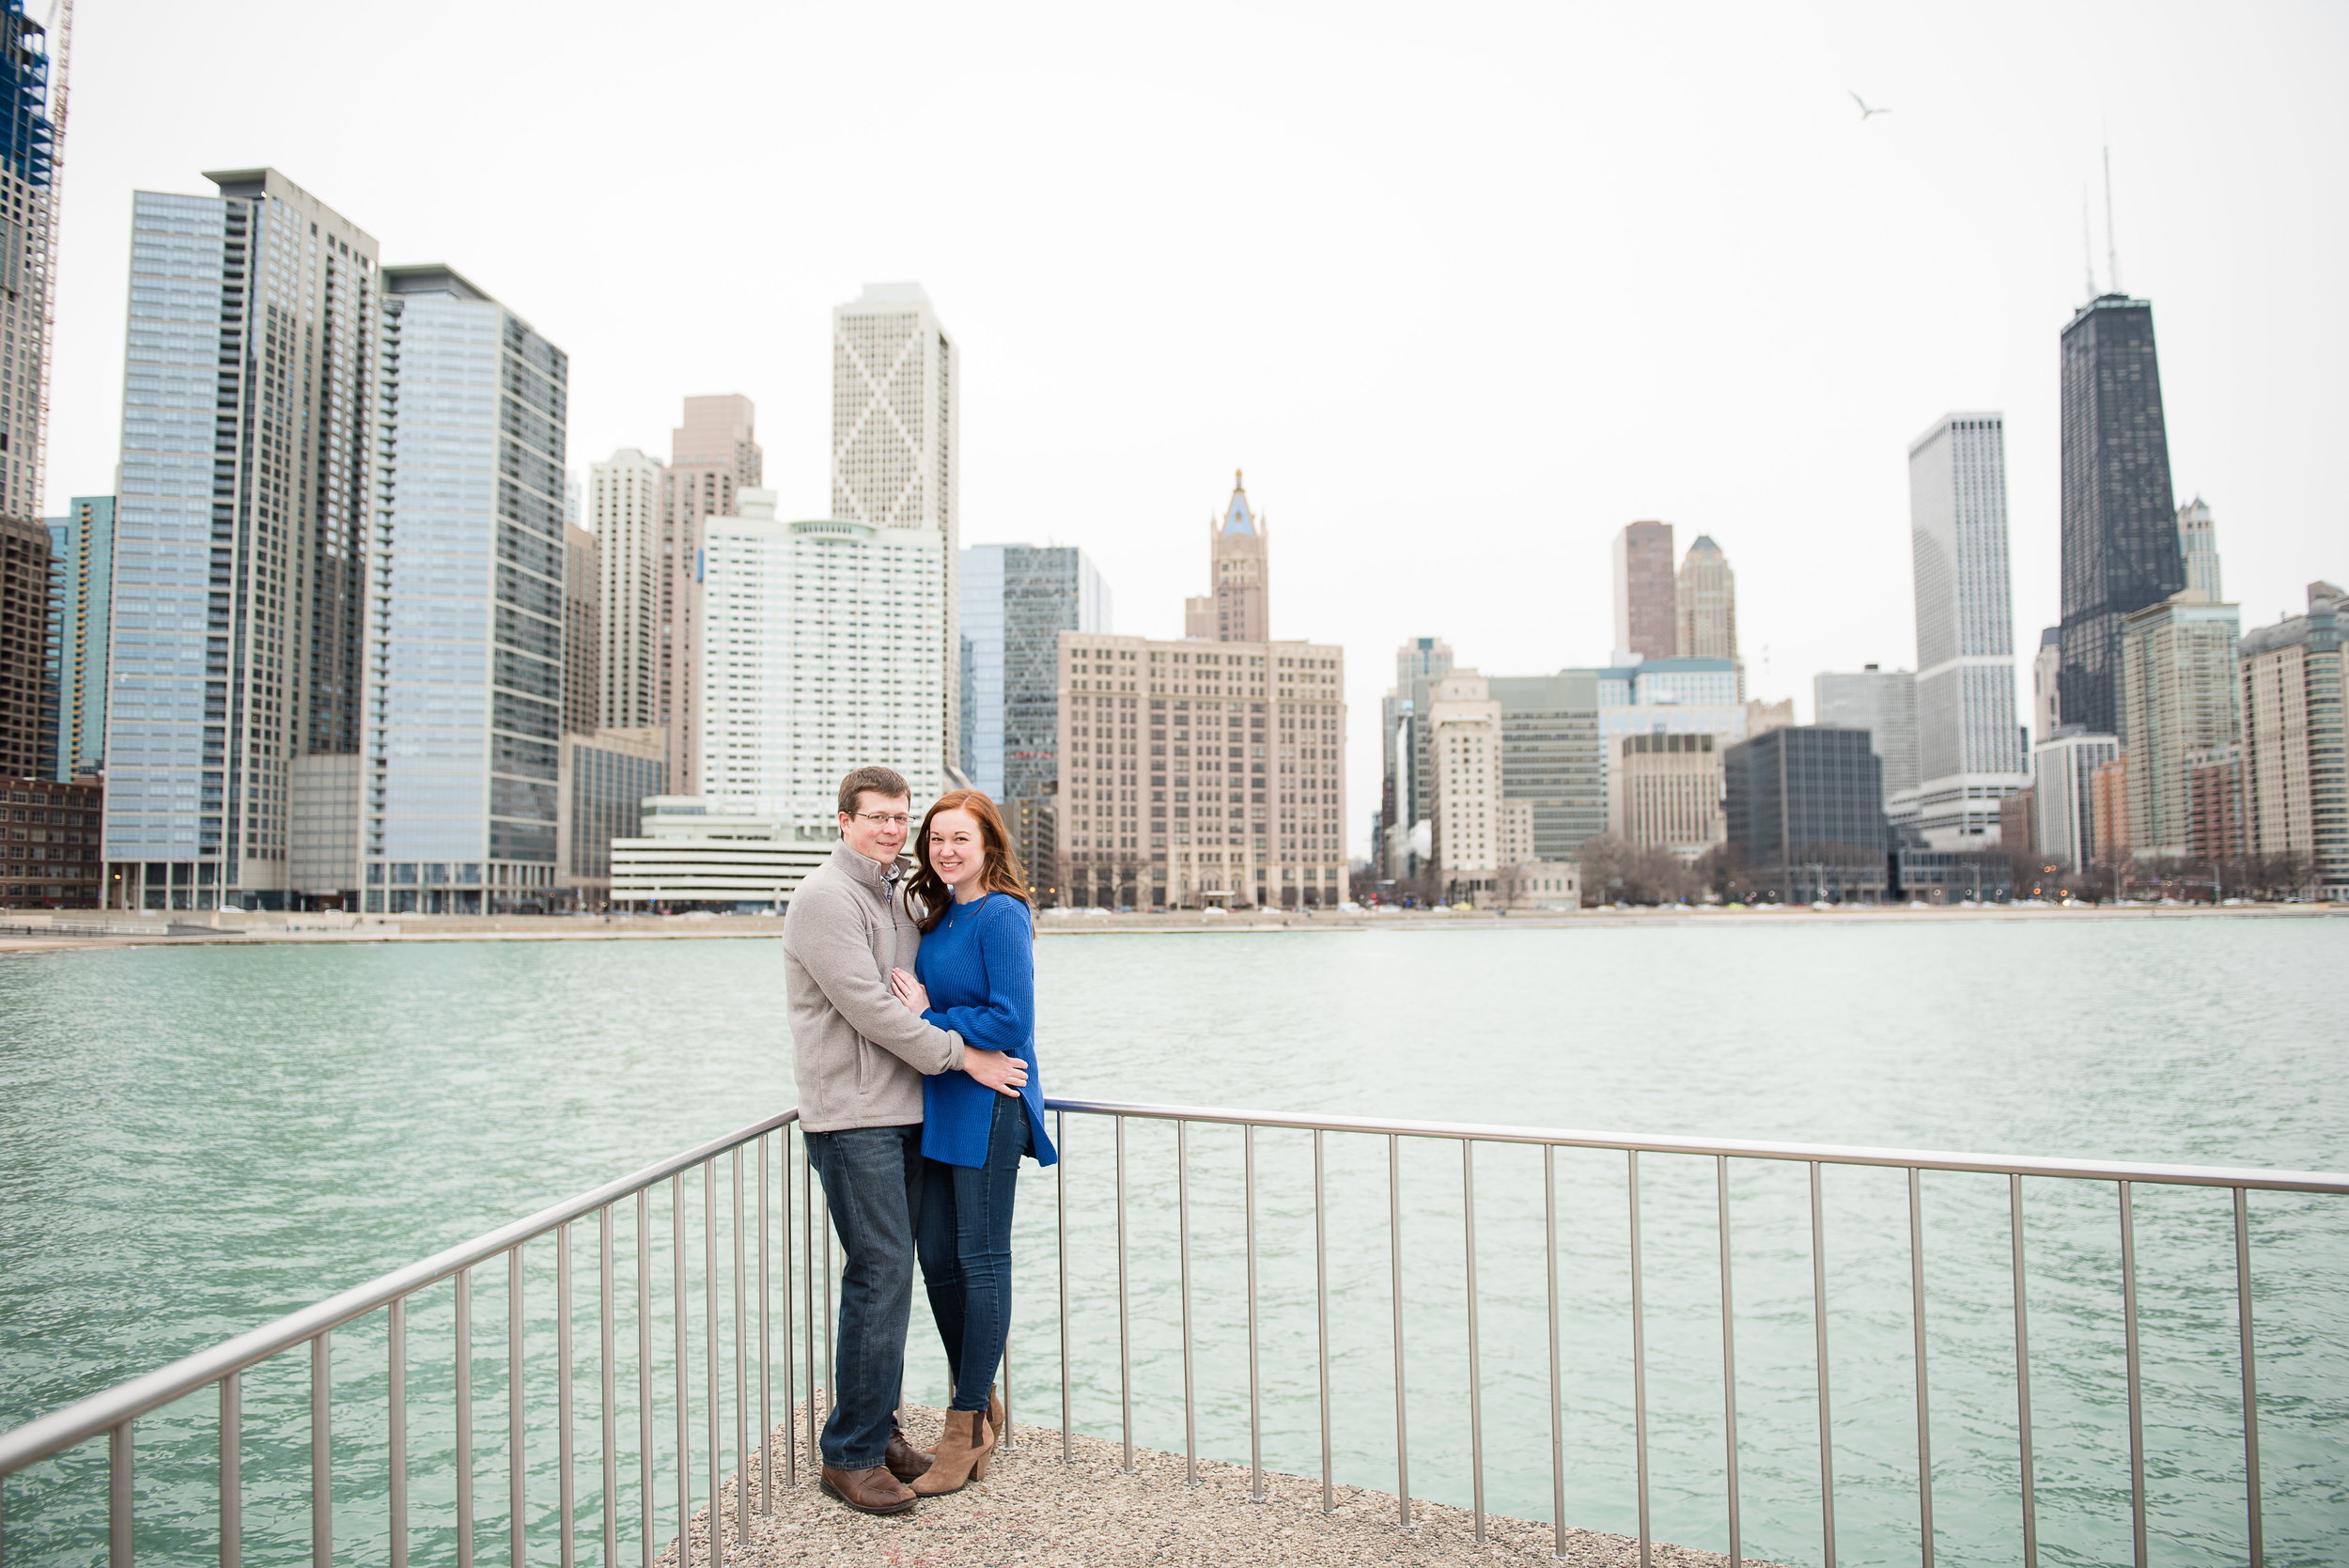 chicago-engagement-photography-metts-photo-6.jpg